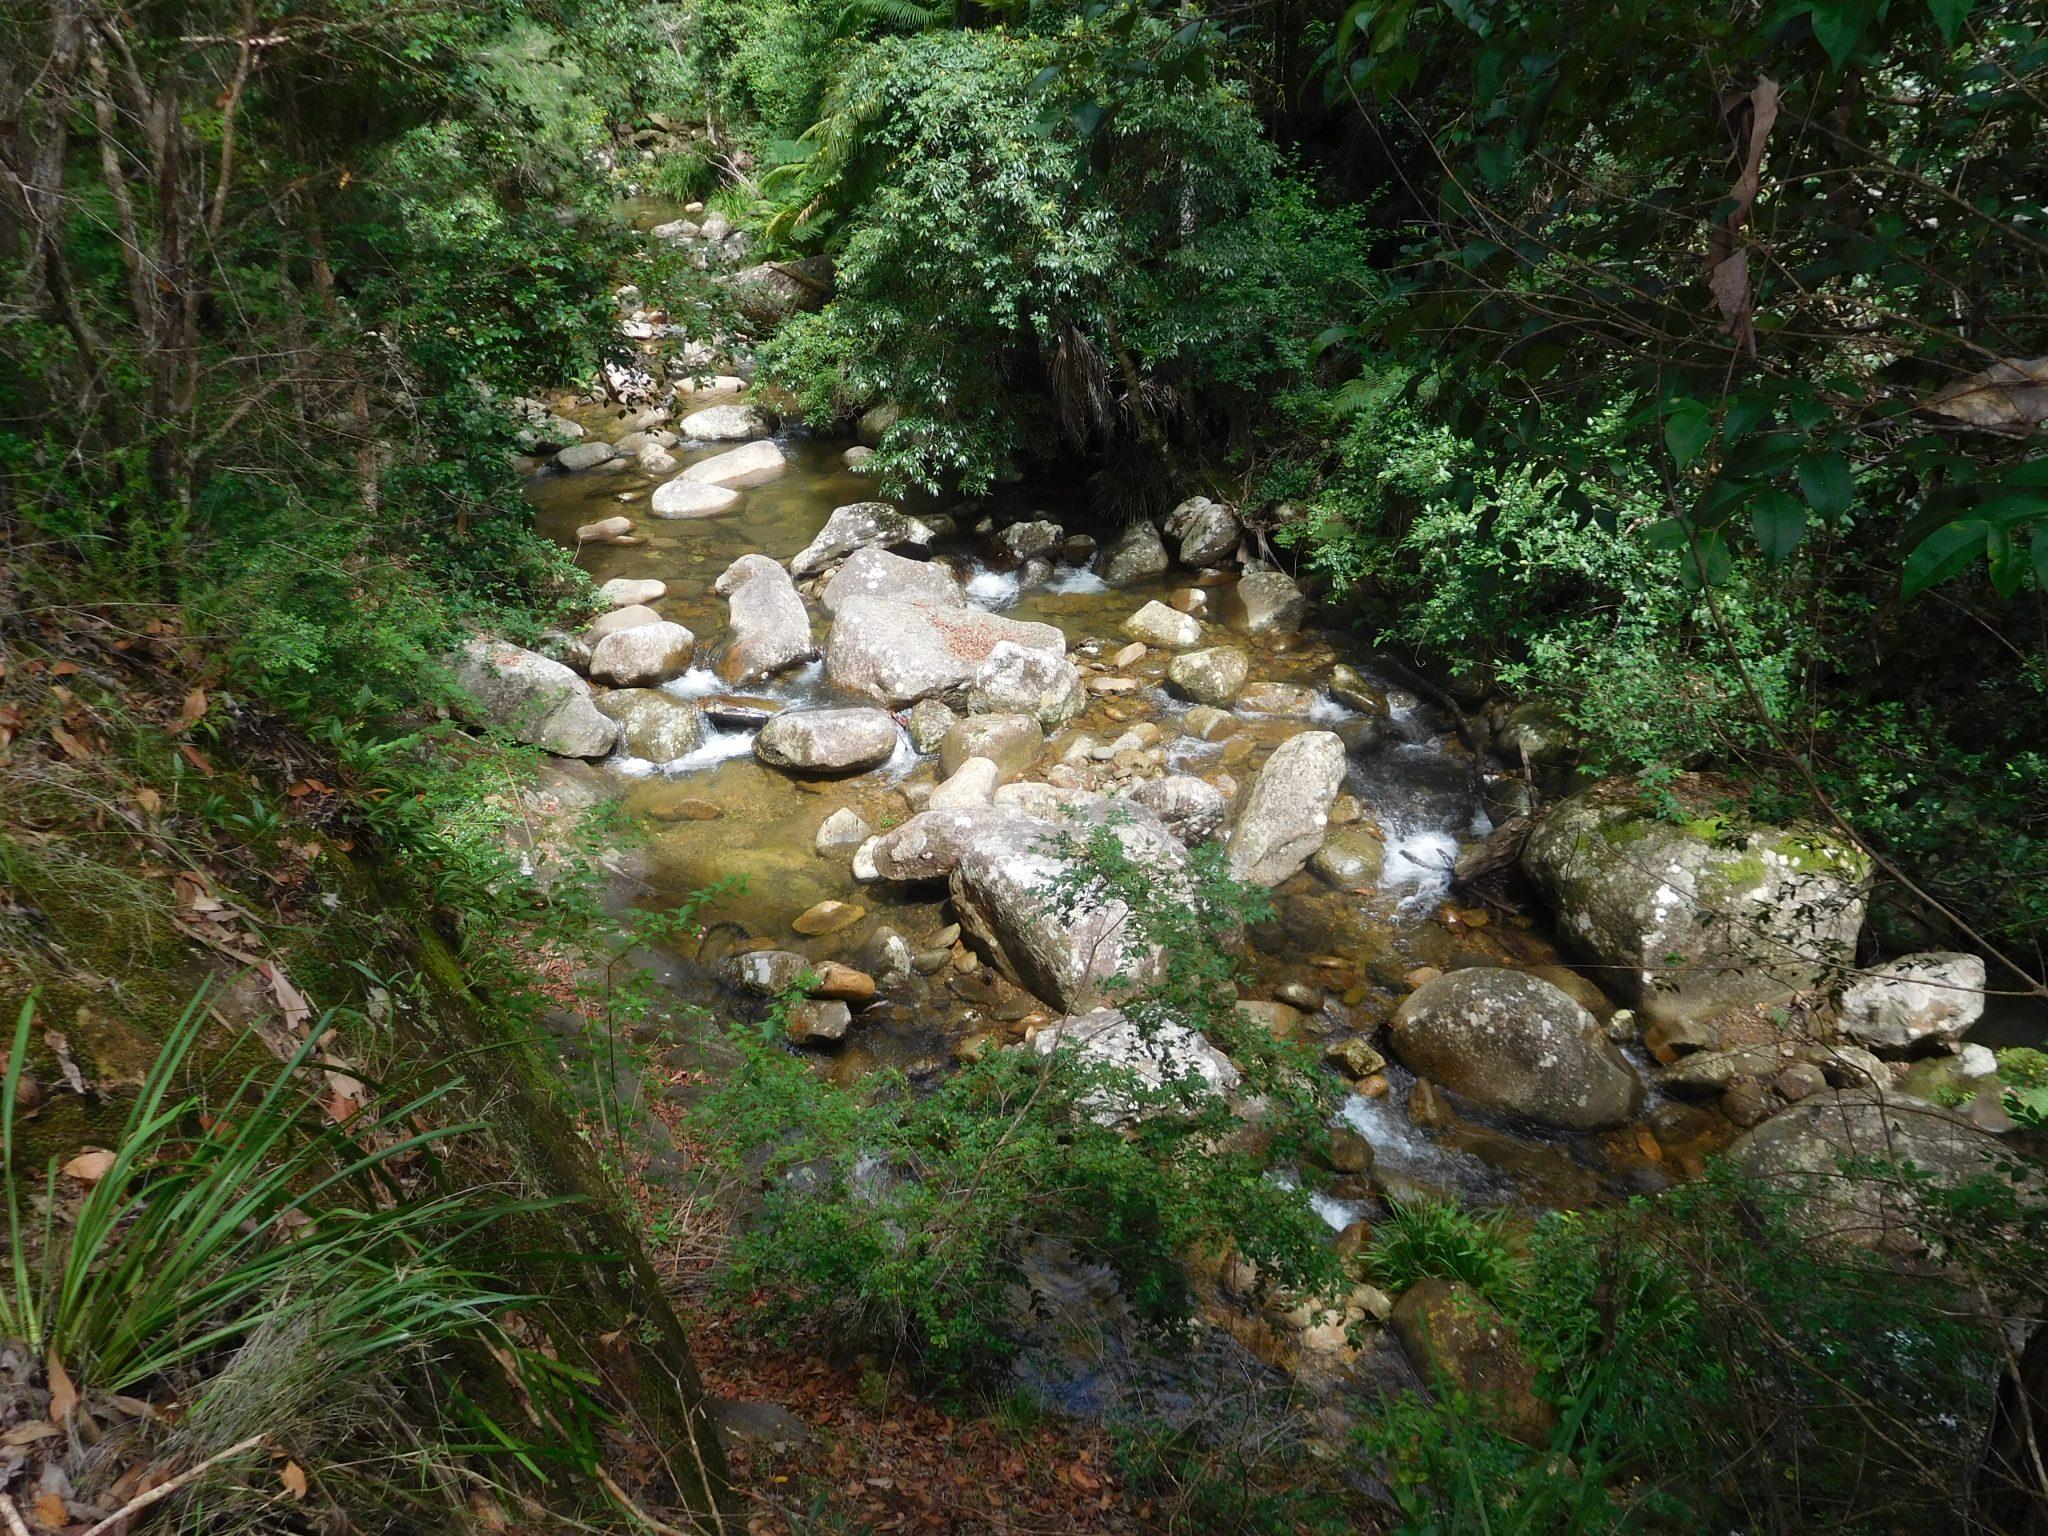 The local creeks